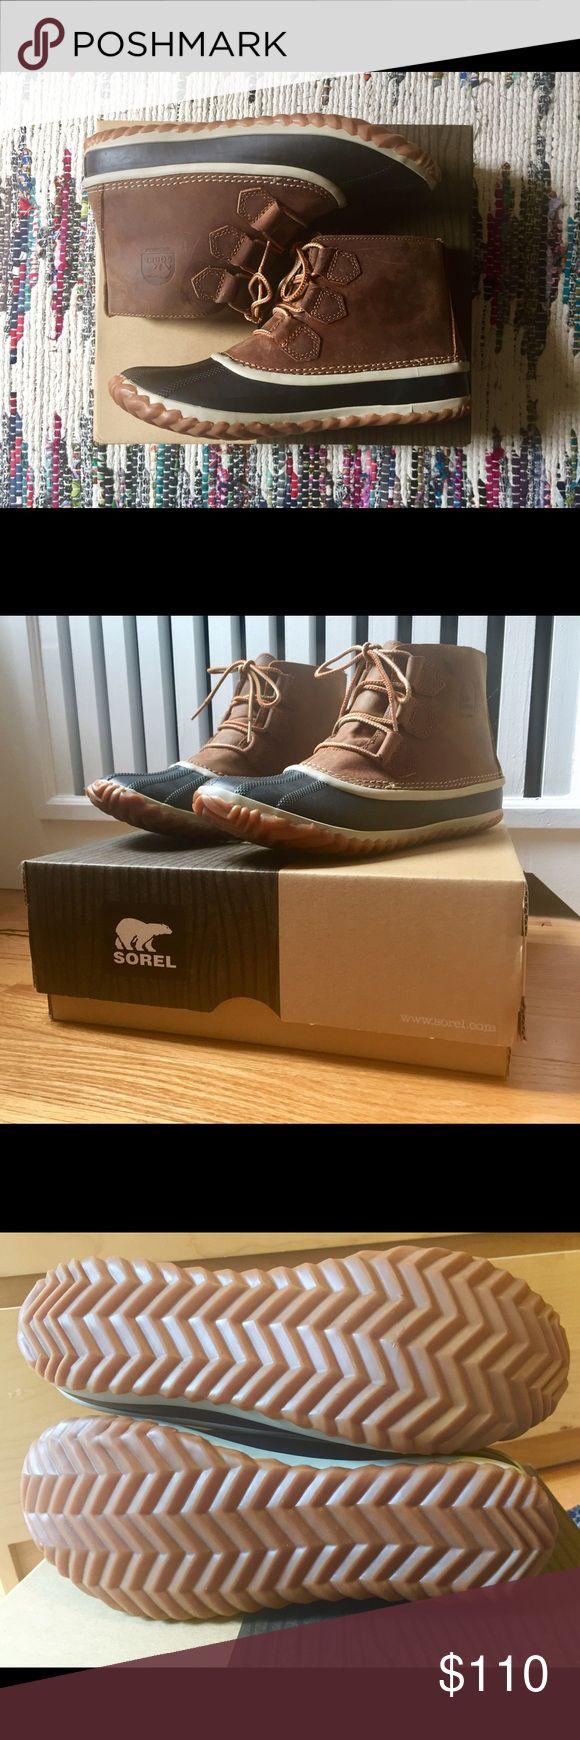 Sorel snow boots Brand new Sorel snow boots. Size 9. Never worn! Sorel Shoes Winter & Rain Boots